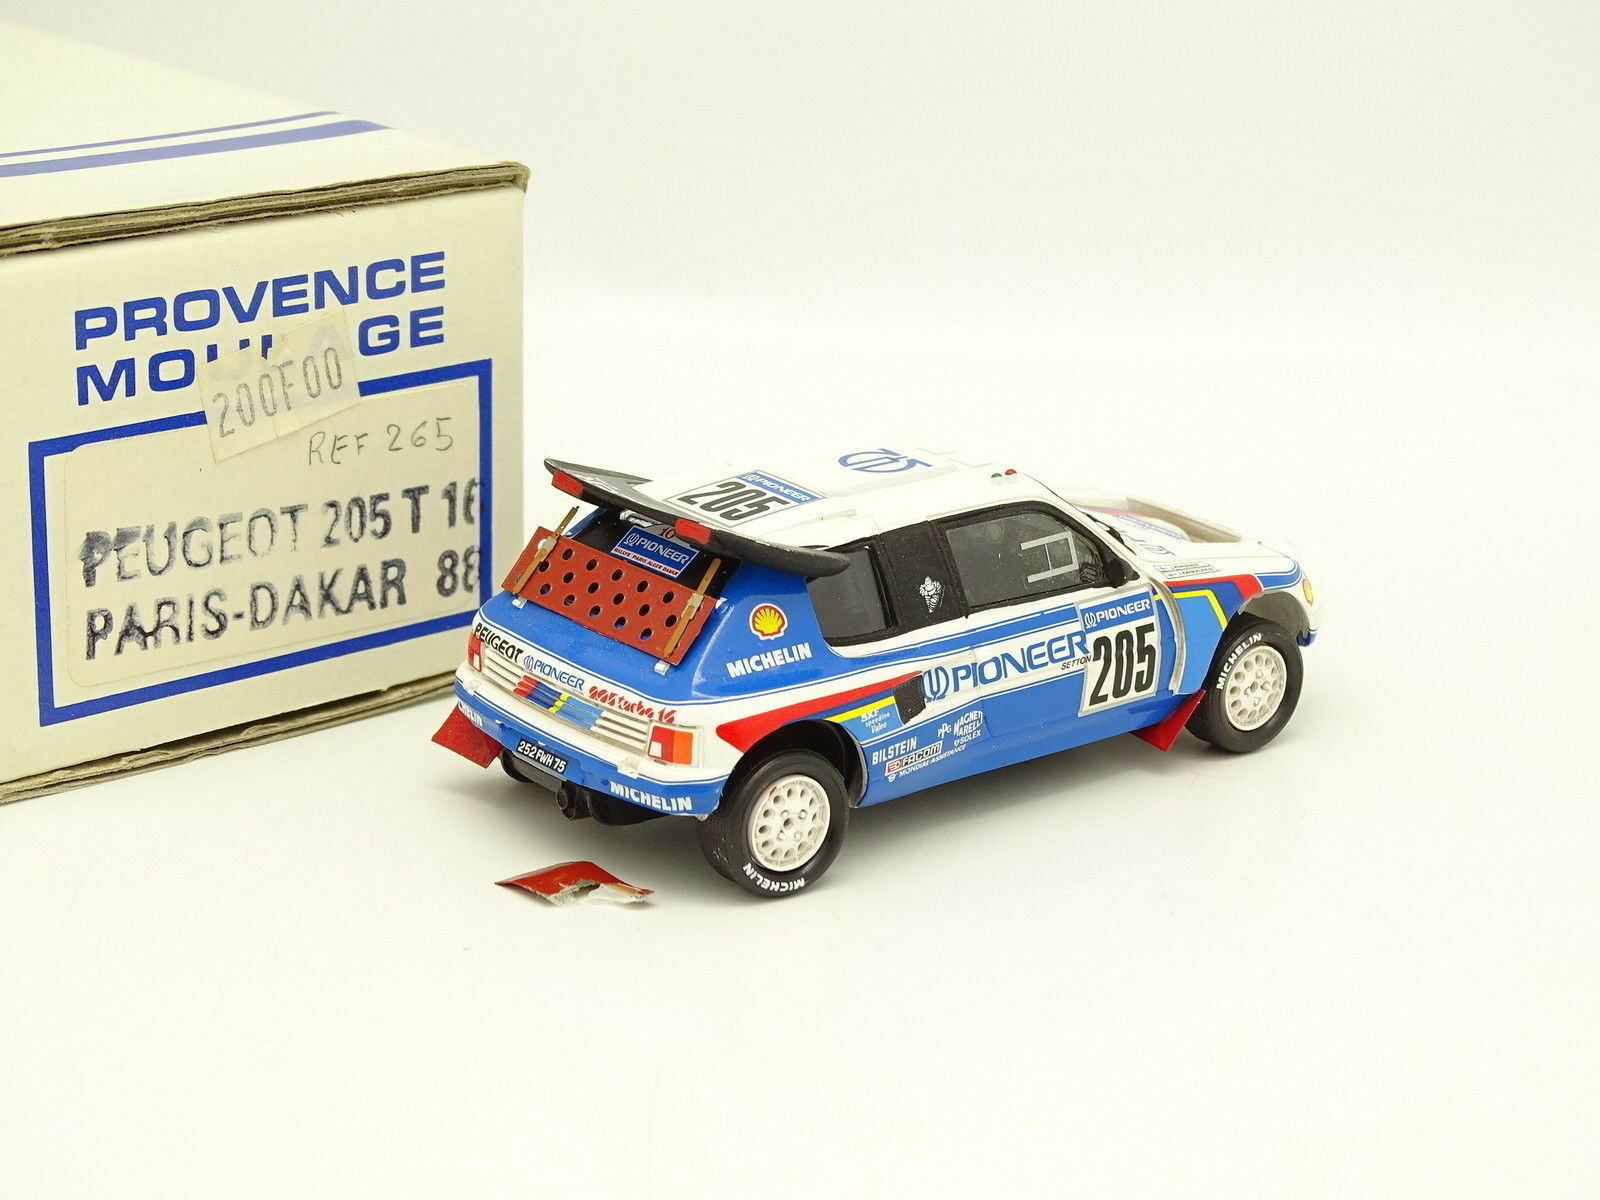 Provence Moulage Set Aufgebaut 1 43 - Peugeot Peugeot Peugeot 205 T16 Paris Dakar 1988 Kankkunen e9f23b